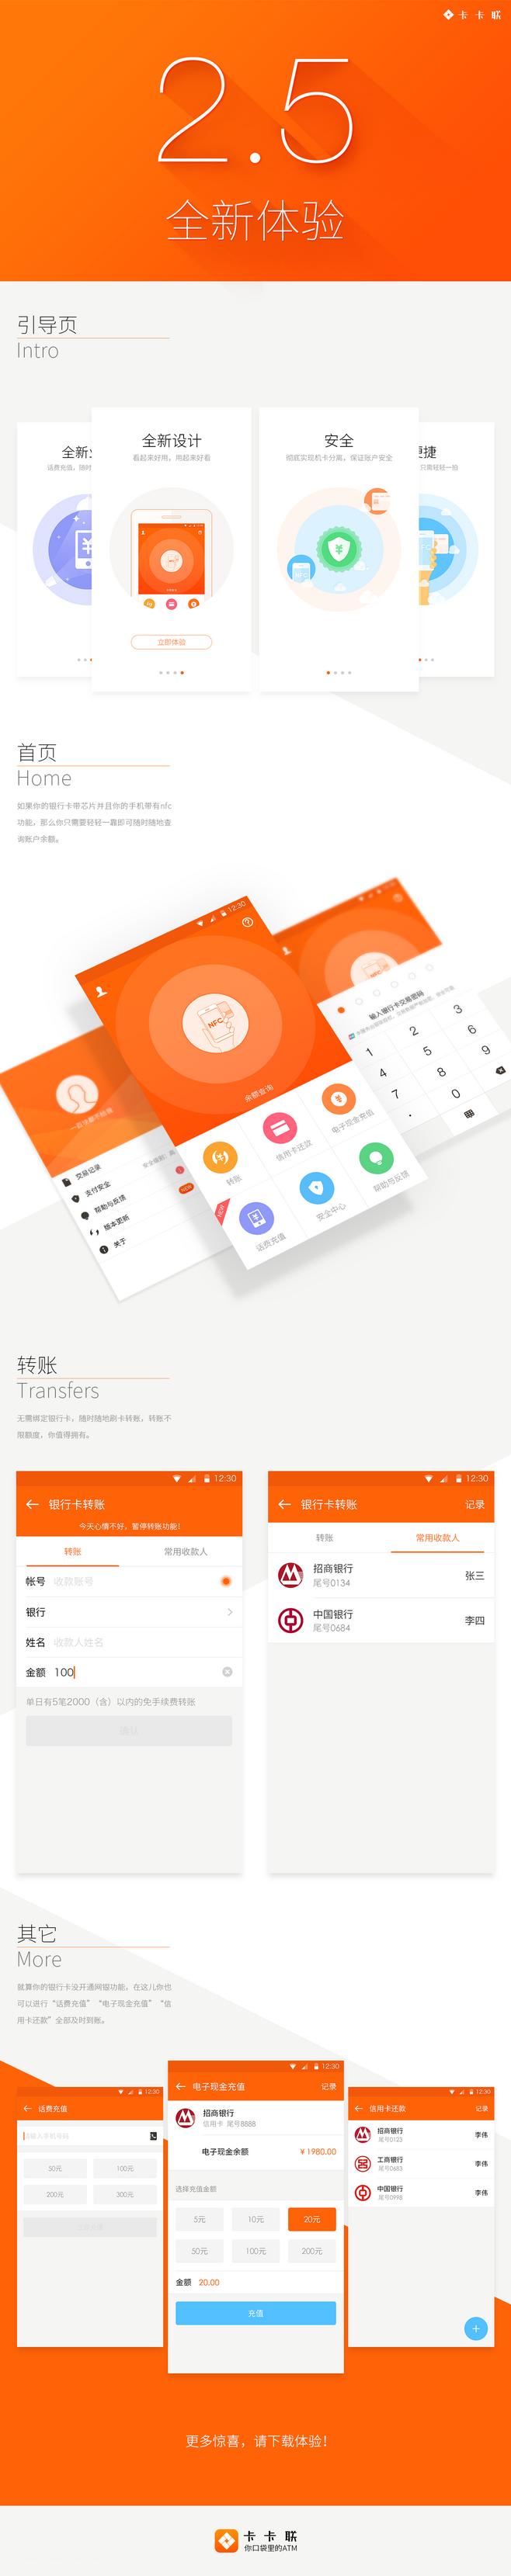 appUI设计欣赏2